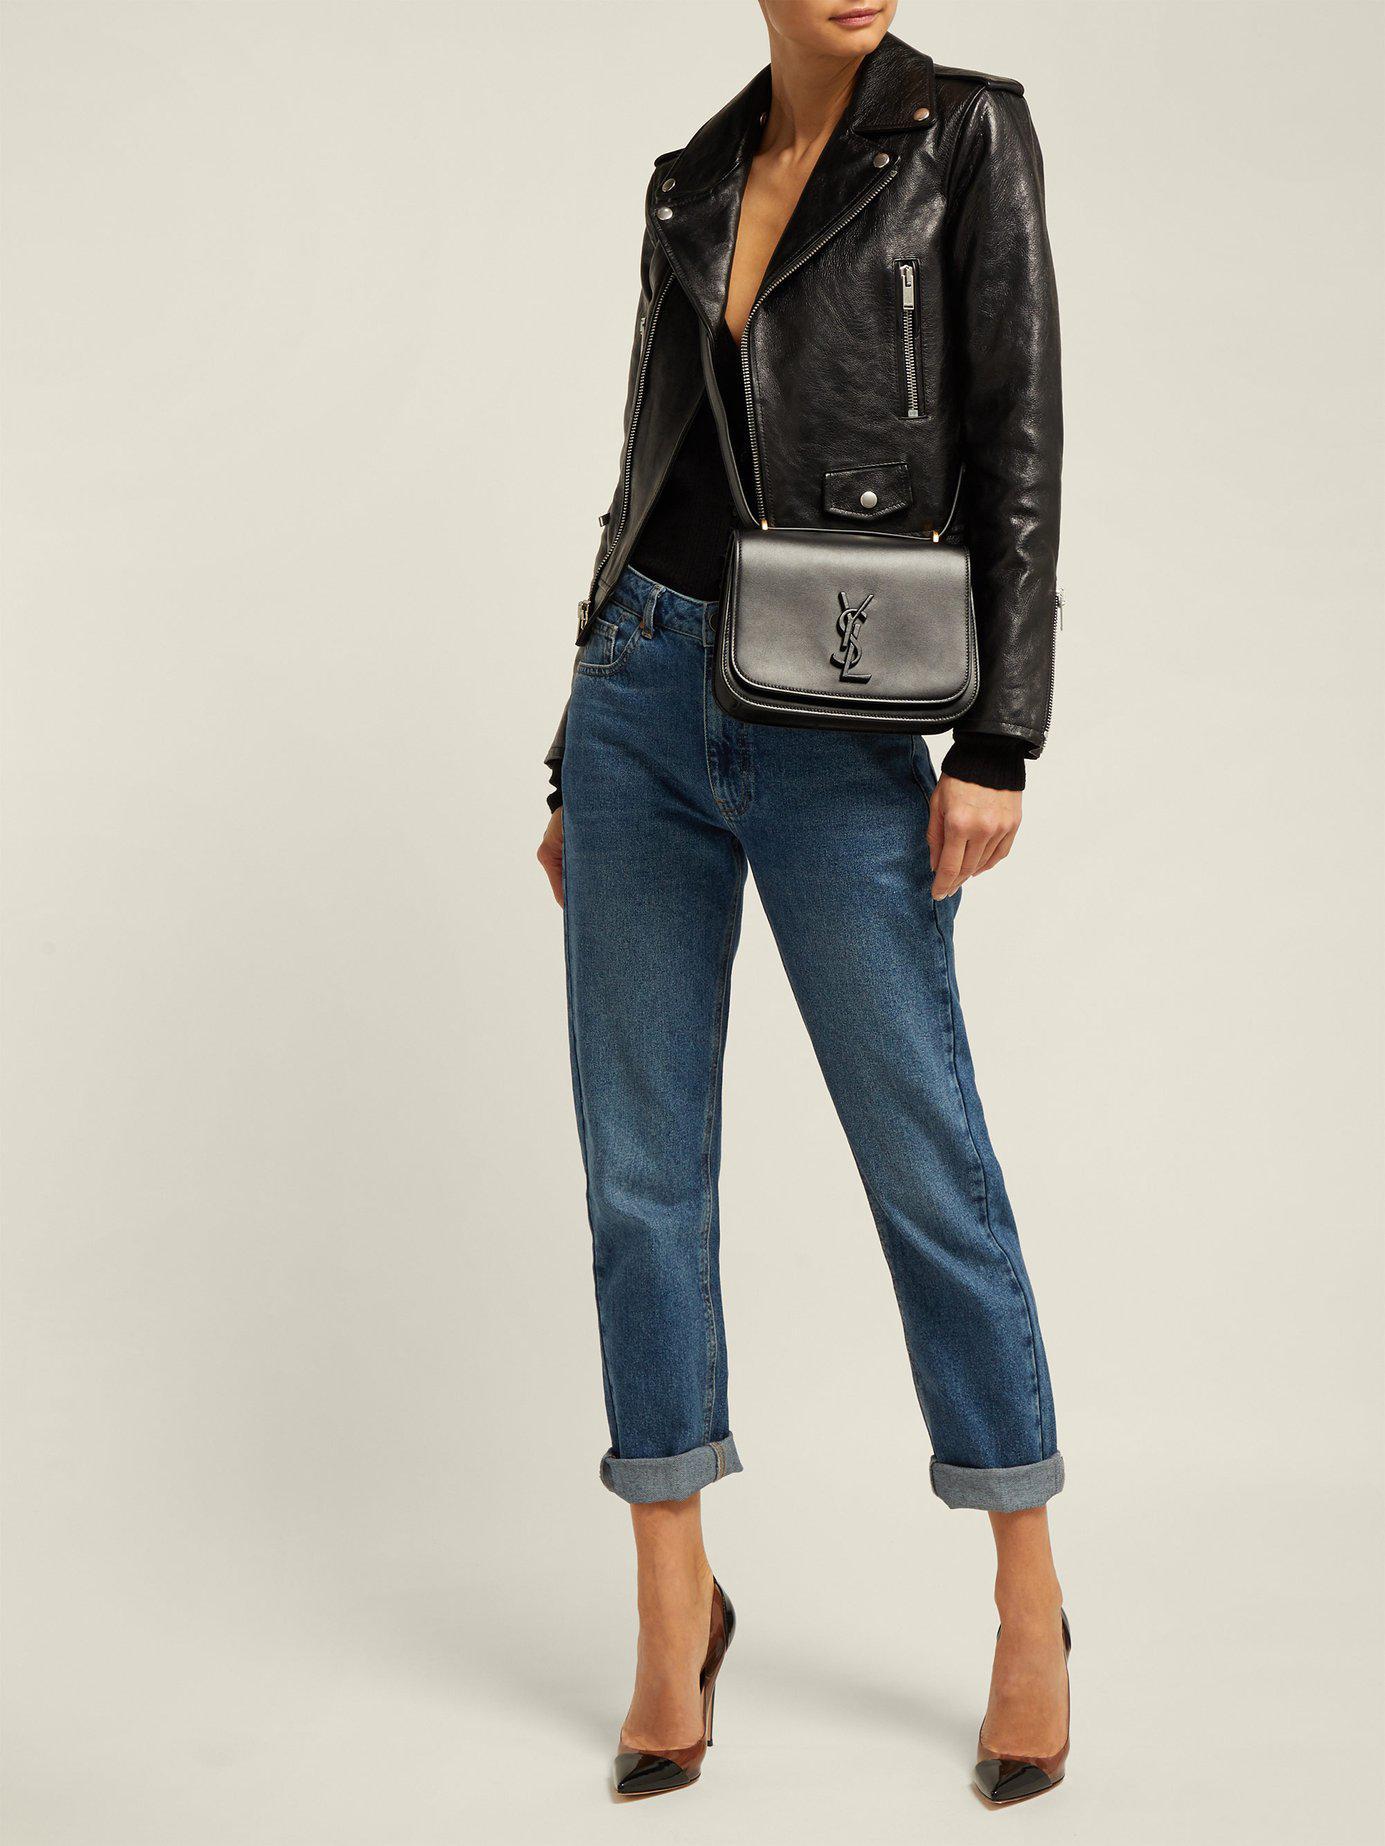 cbf6c5472ad Saint Laurent Spontini Small Leather Cross Body Bag in Black - Lyst